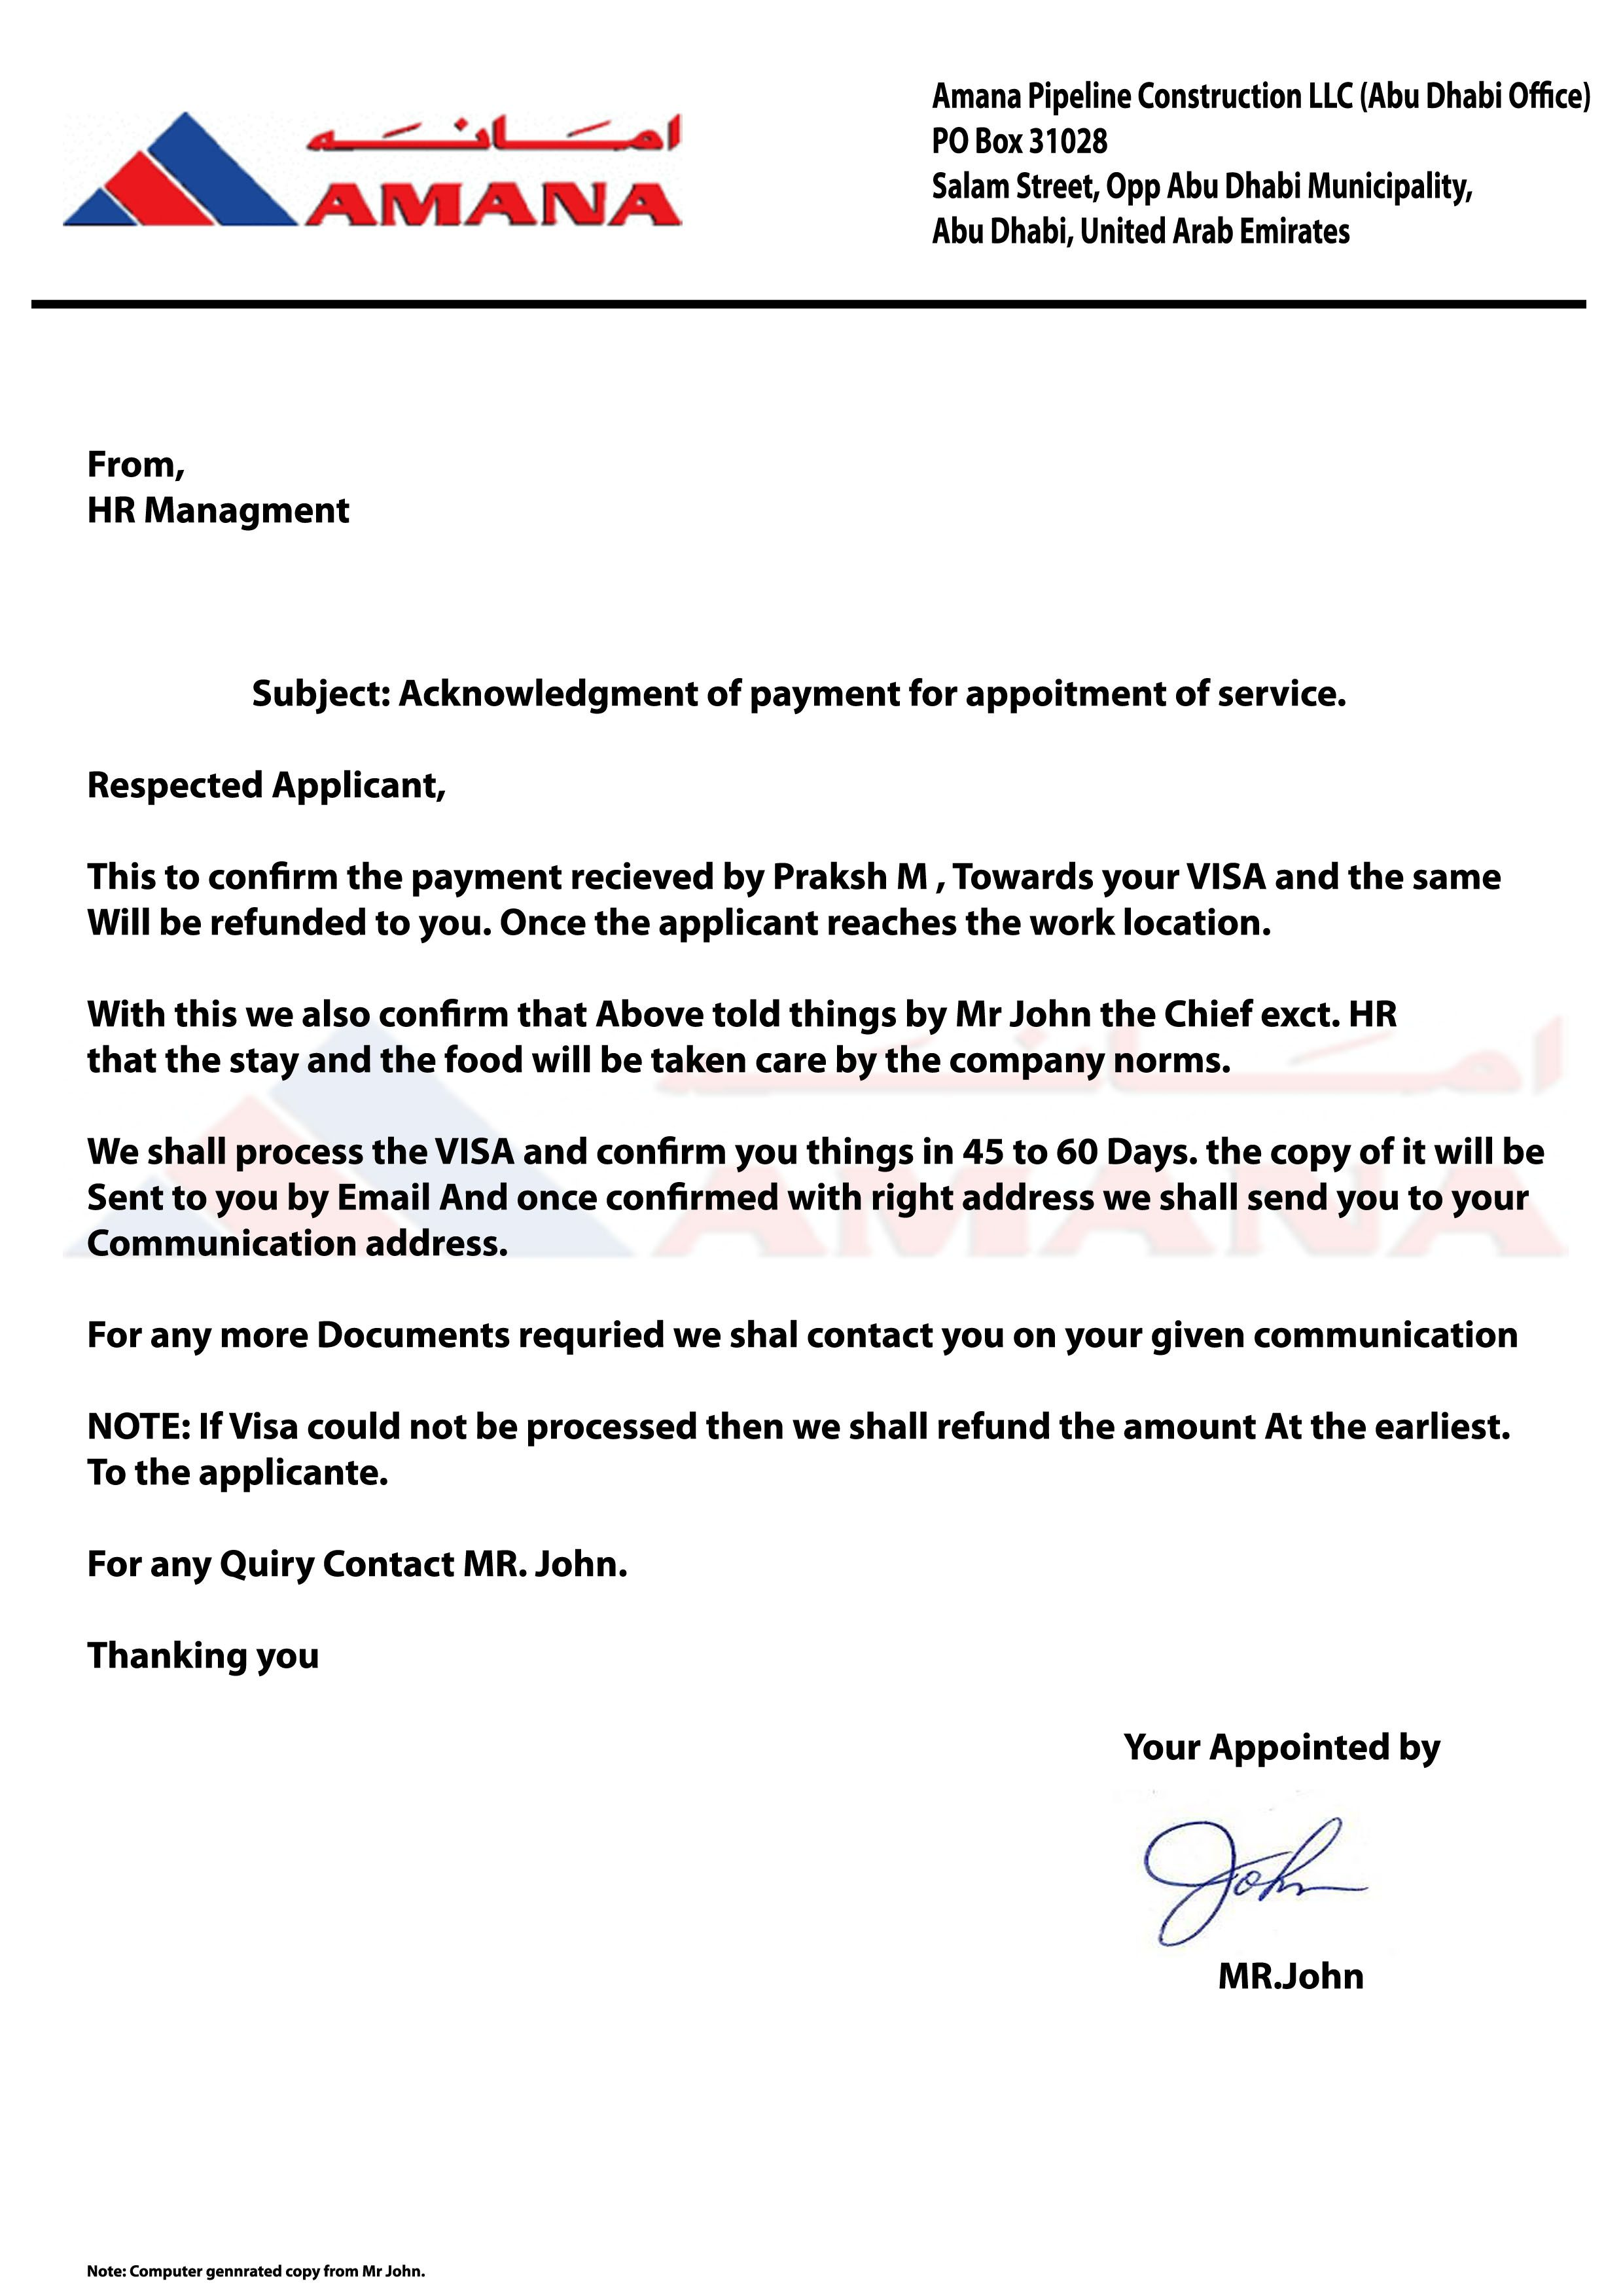 Job Scam Alert Amana Pipeline Construction Appointment Letter